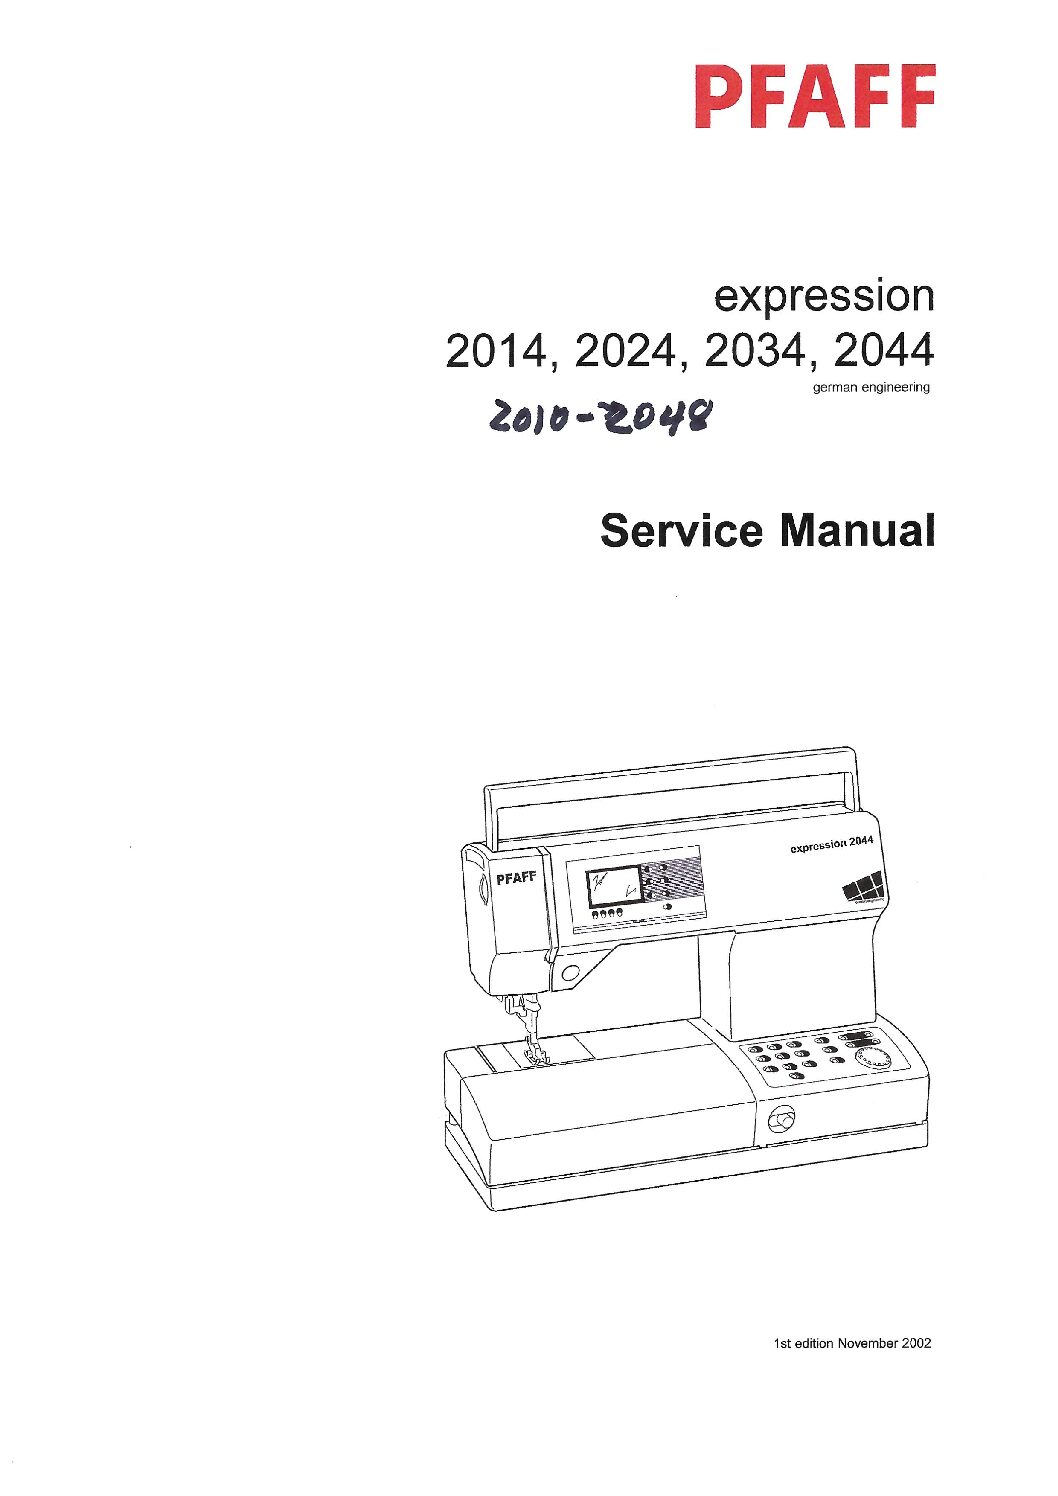 Service Manual Pfaff Expression 2010-2048